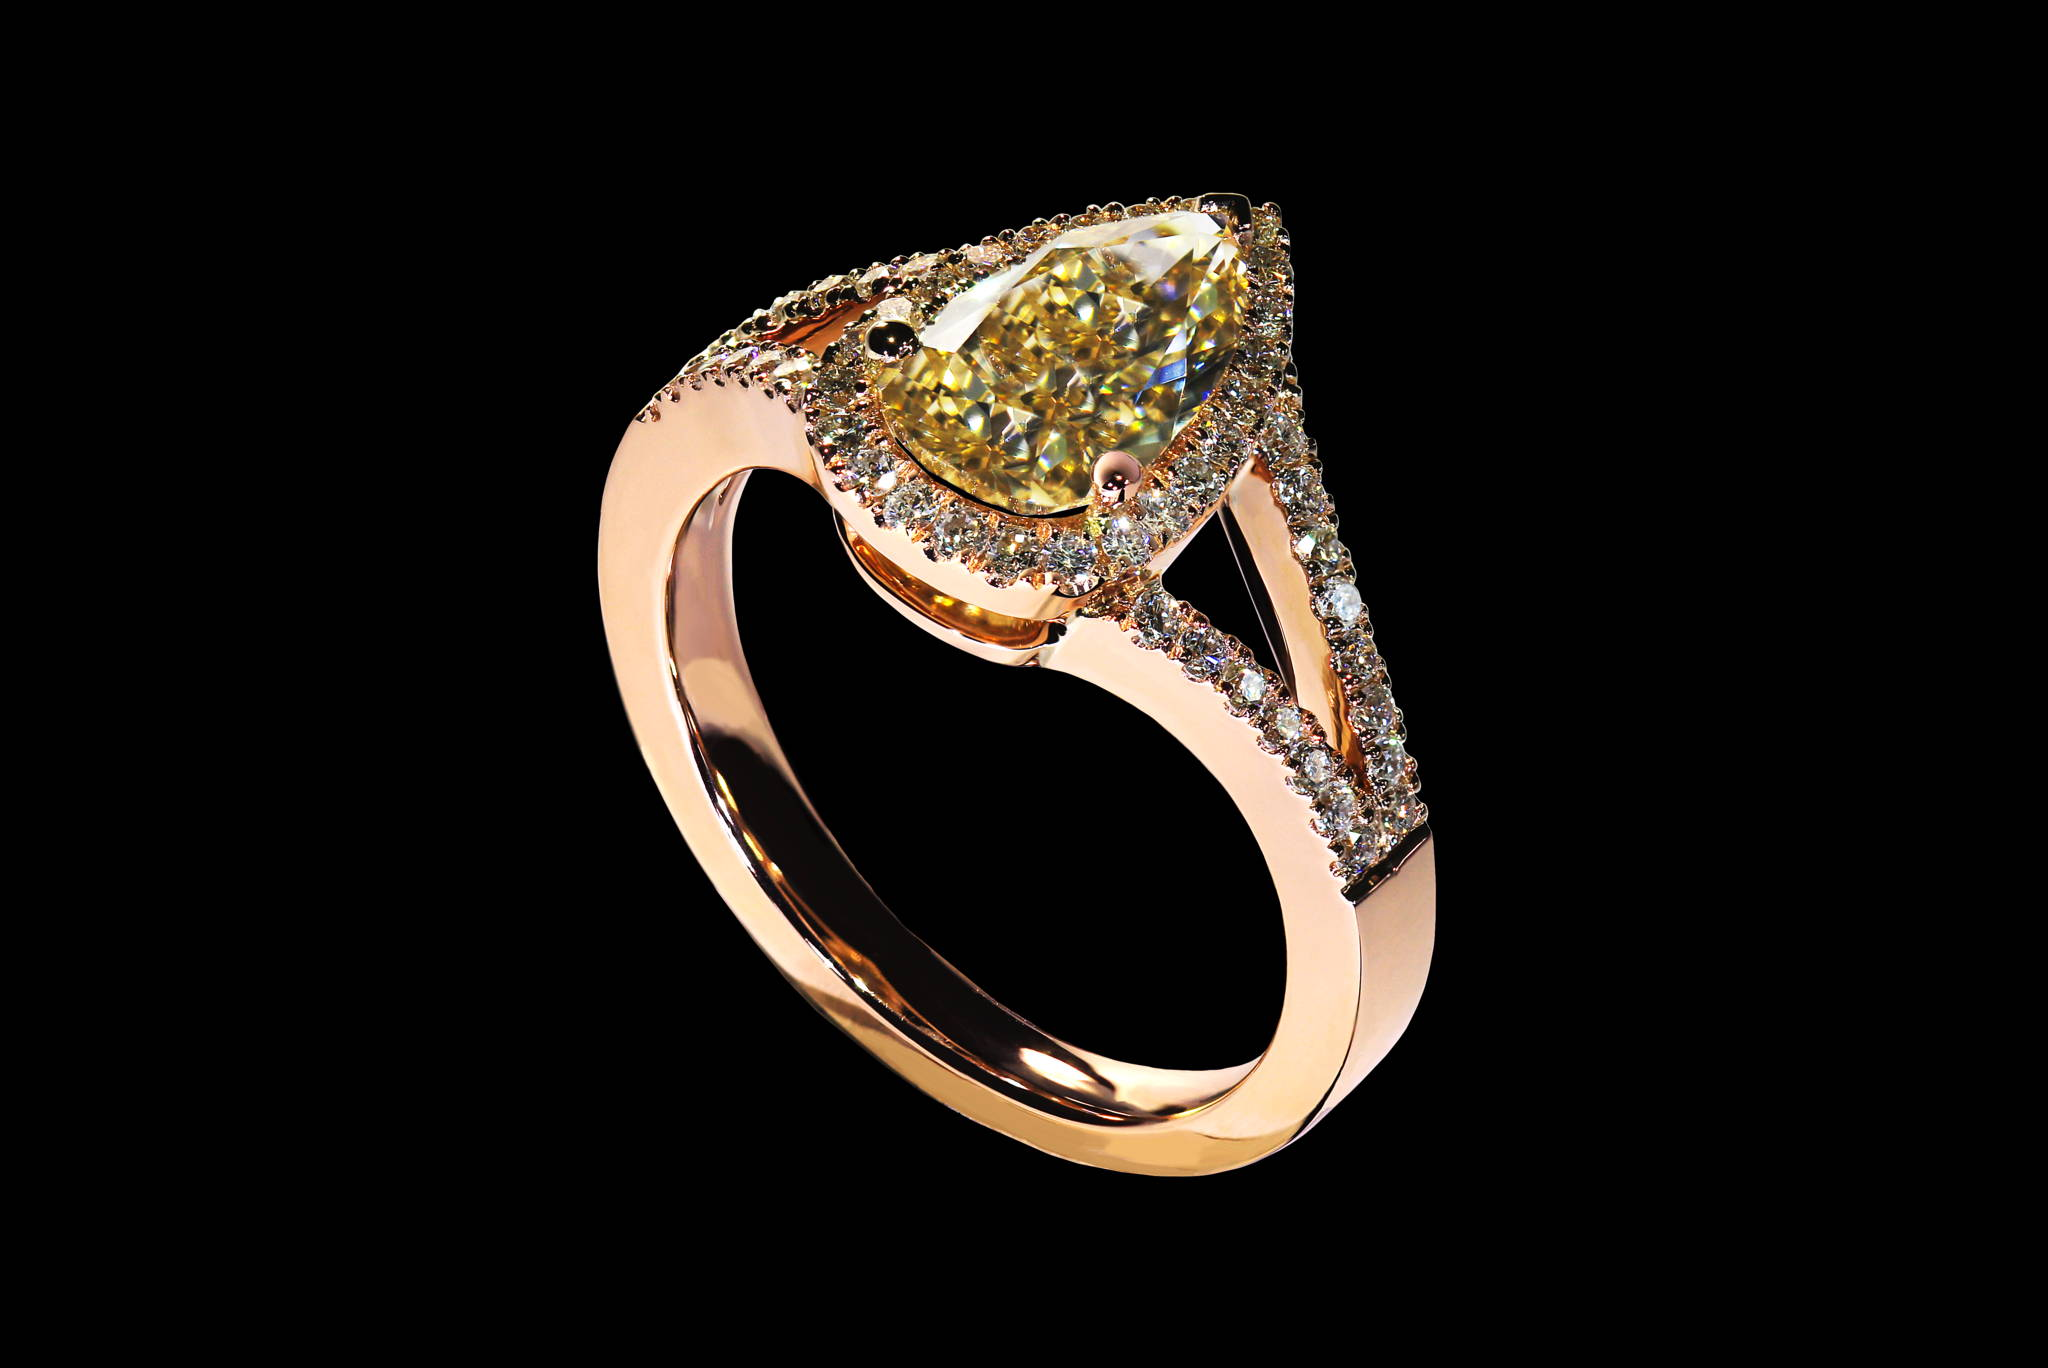 Champagne Sparkles Ring